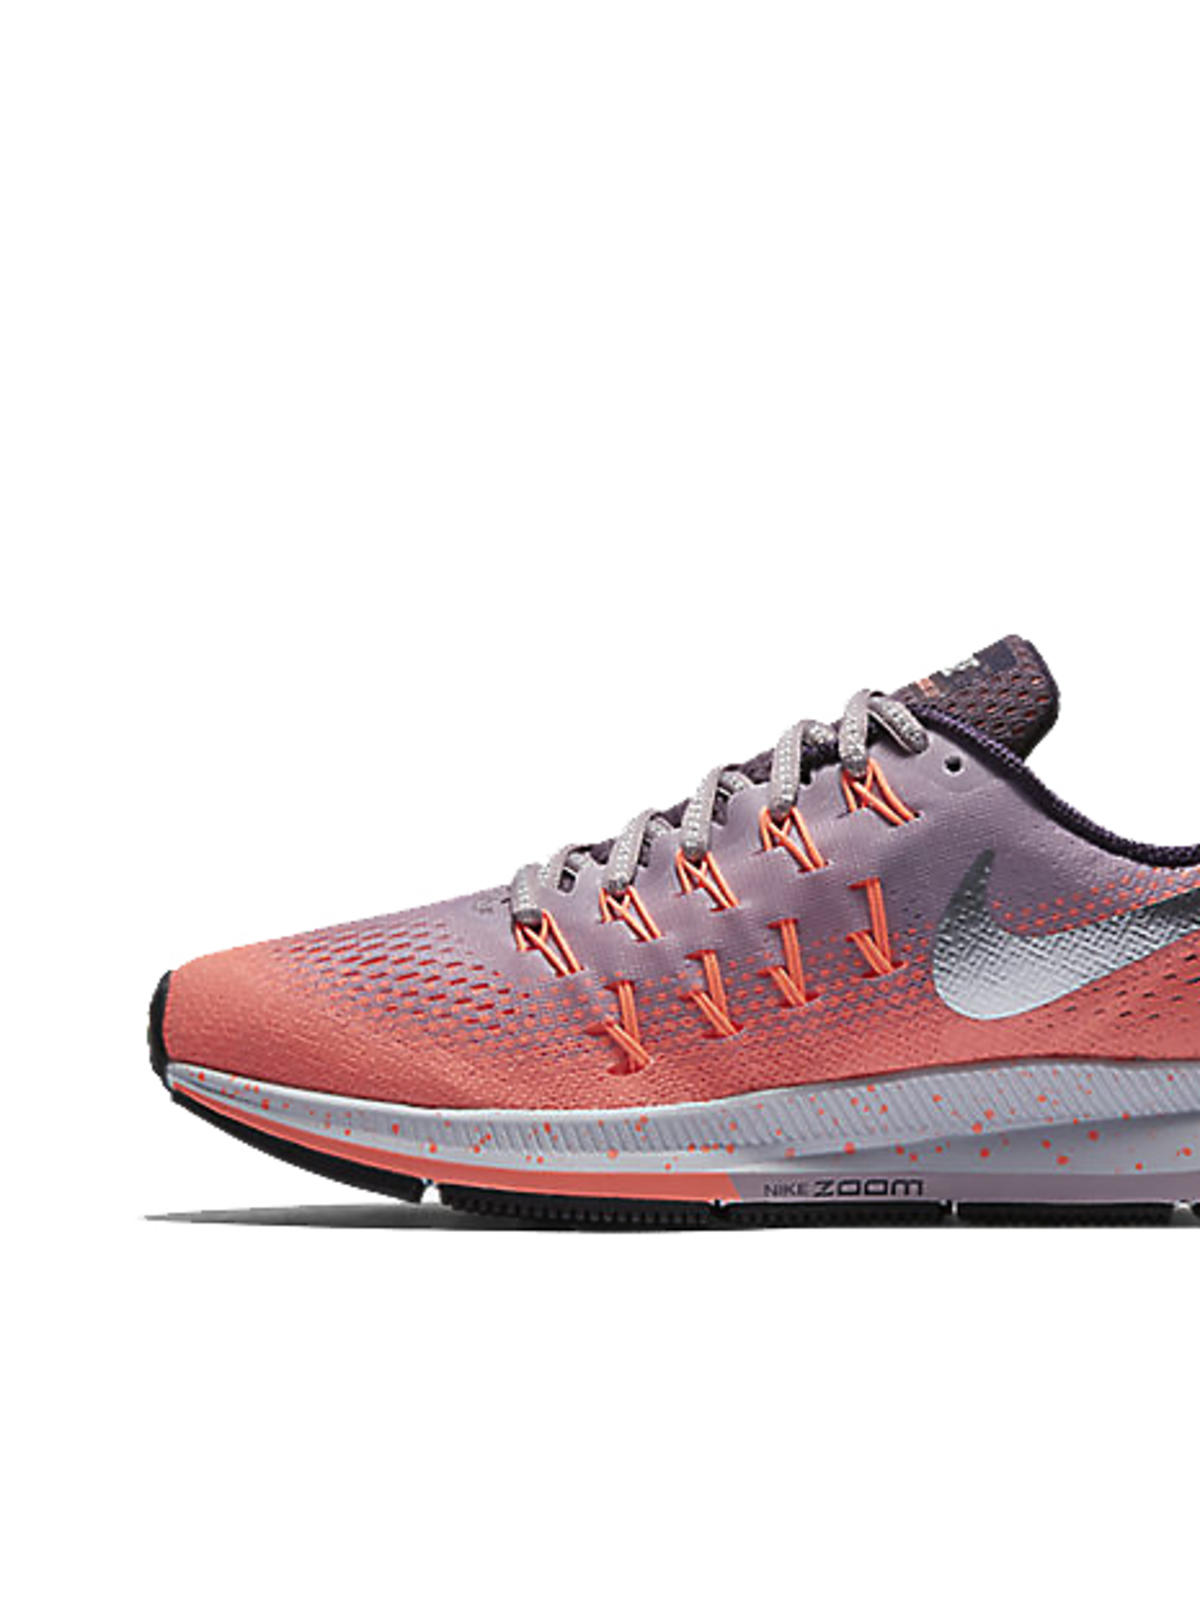 Buty do biegania Nike Air Zoom Pegasus różowe 2017